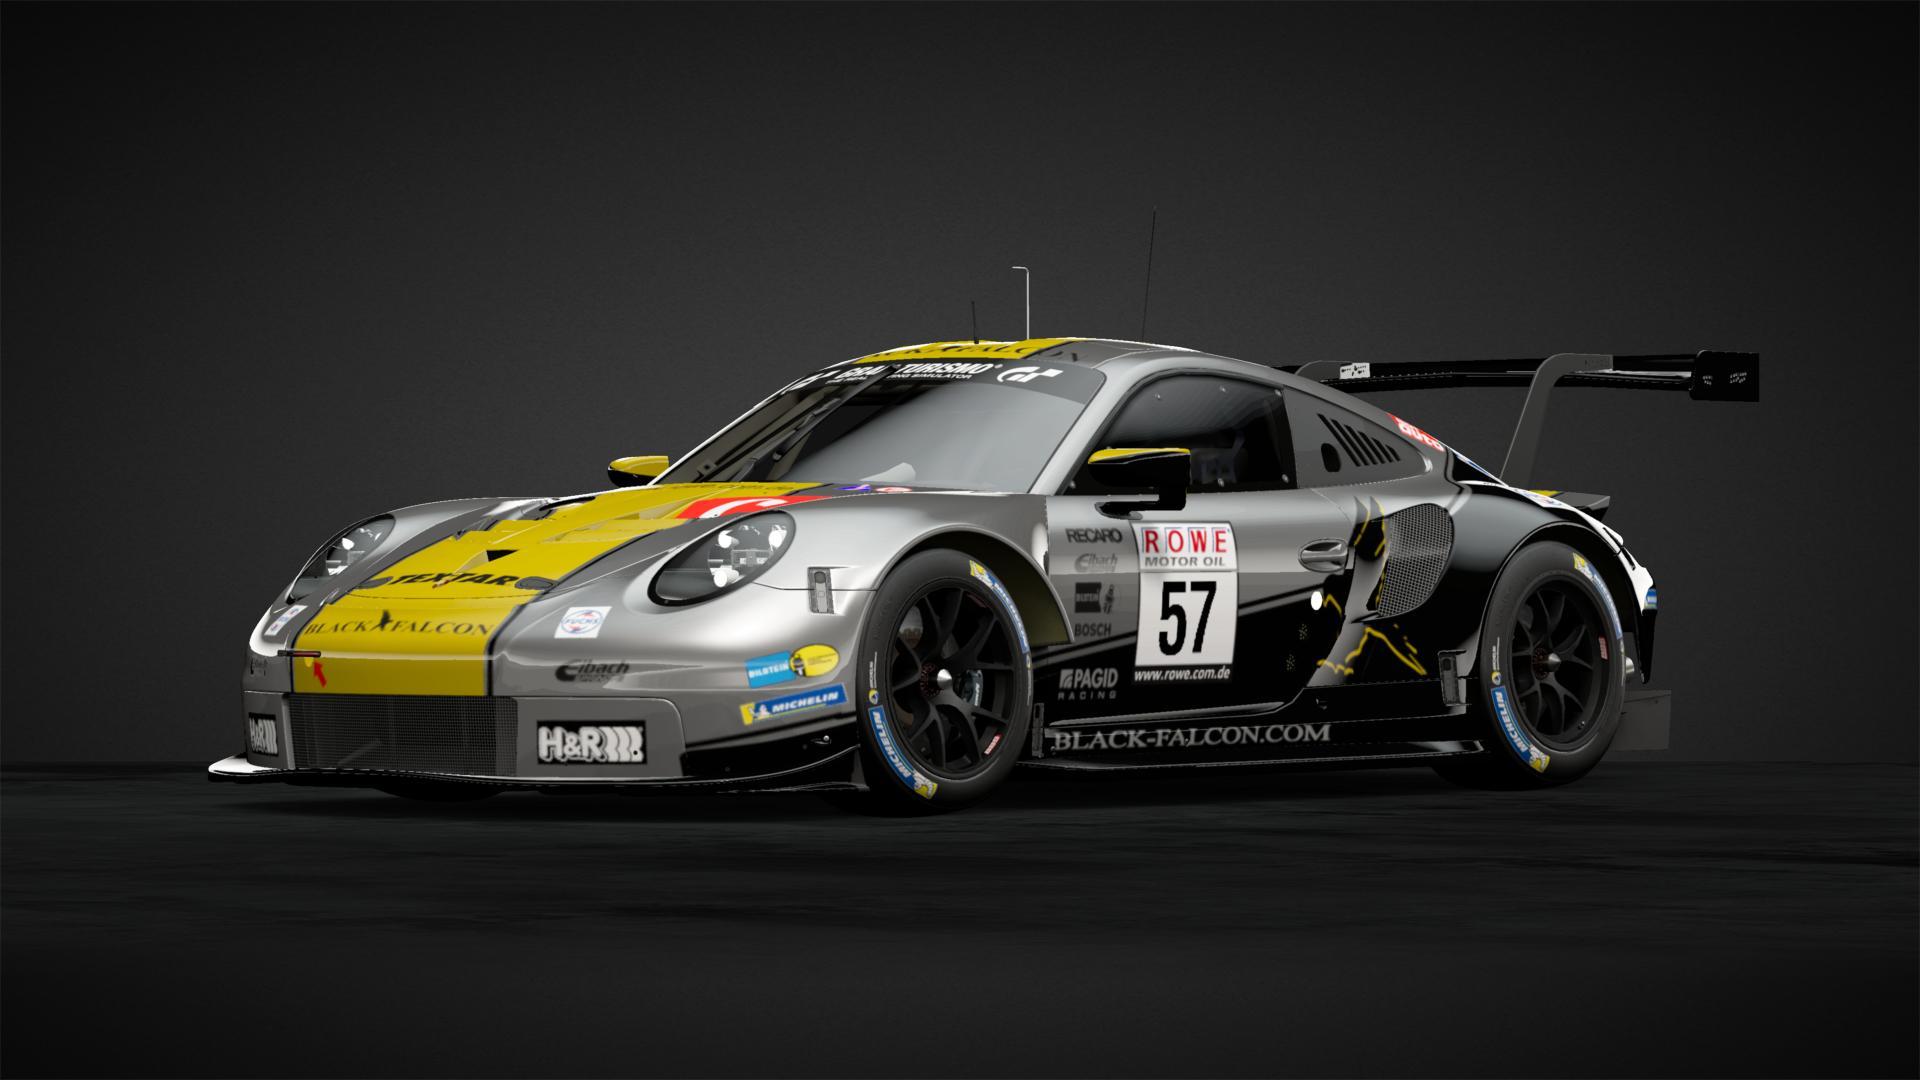 Porsche Gt3 Black Falcon Racing Car Livery By Tgr97 Mika Community Gran Turismo Sport